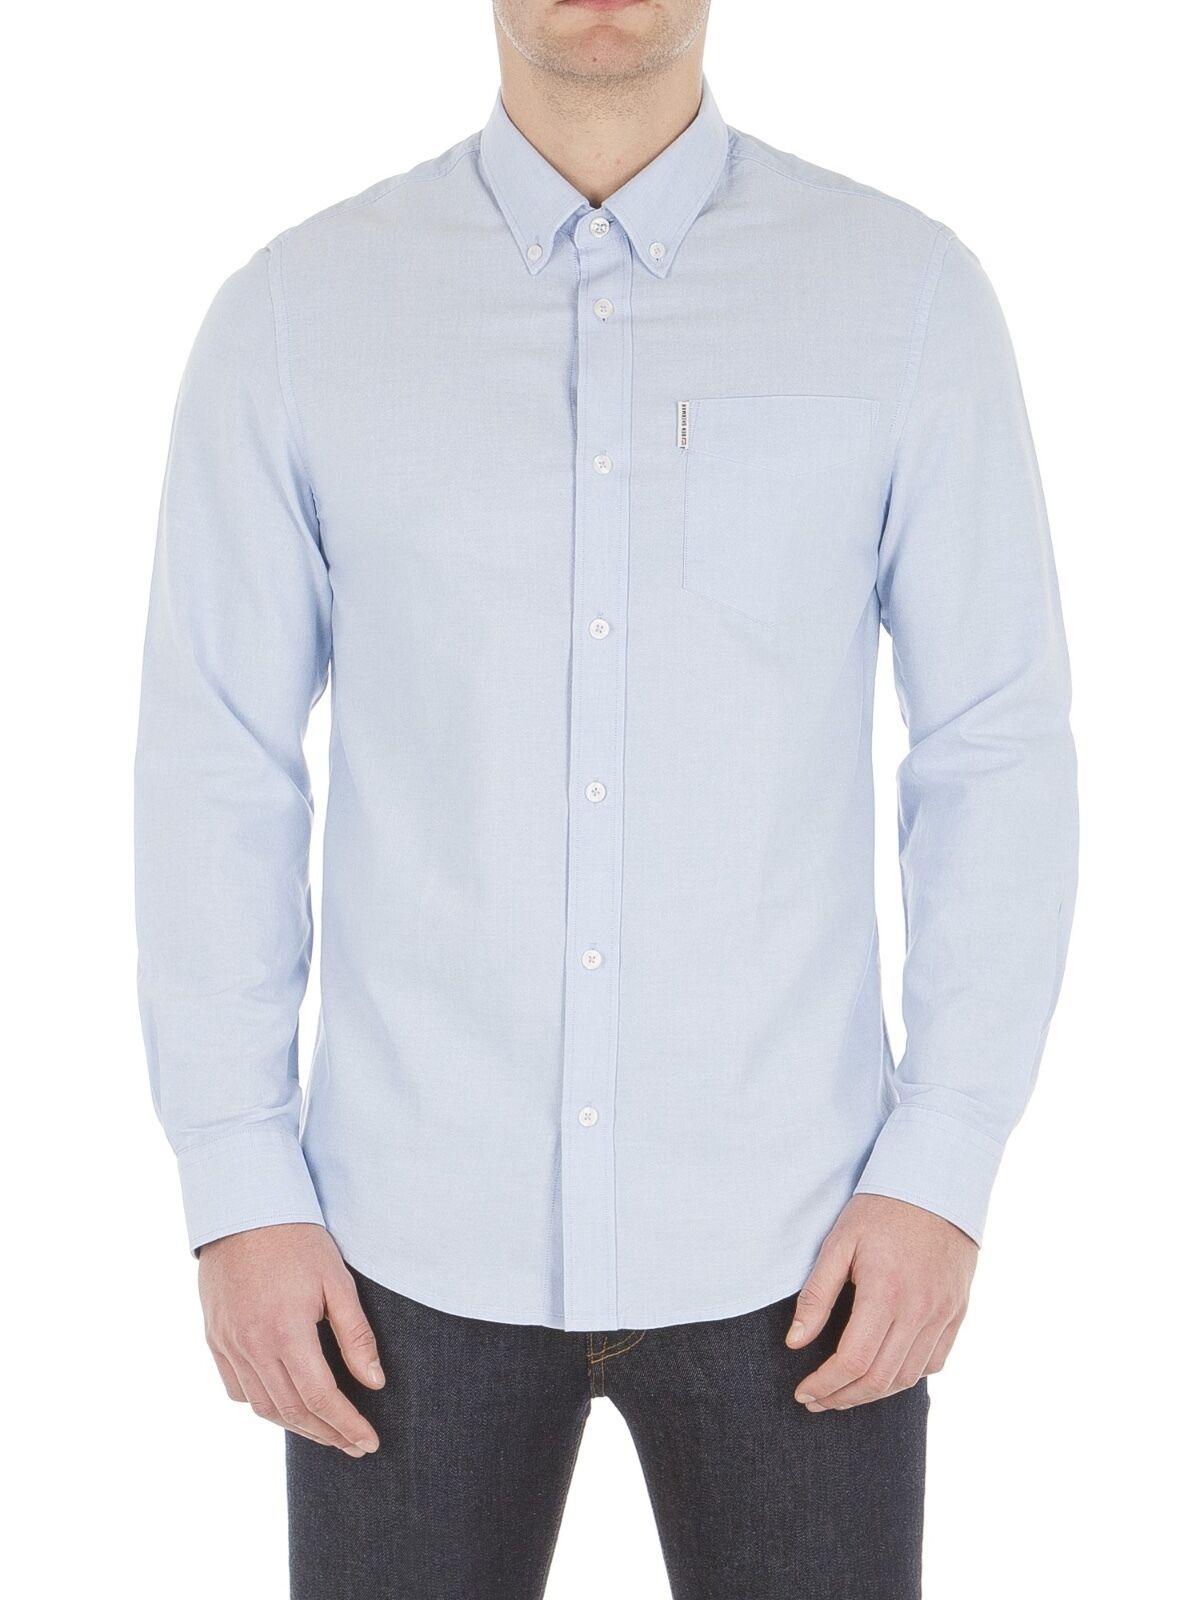 Ben Sherman Mens Cotton Oxford Shirt Regular Fit Fit Fit Long Sleeve Button Down Collar | Sonderaktionen zum Jahresende  8f0f7a